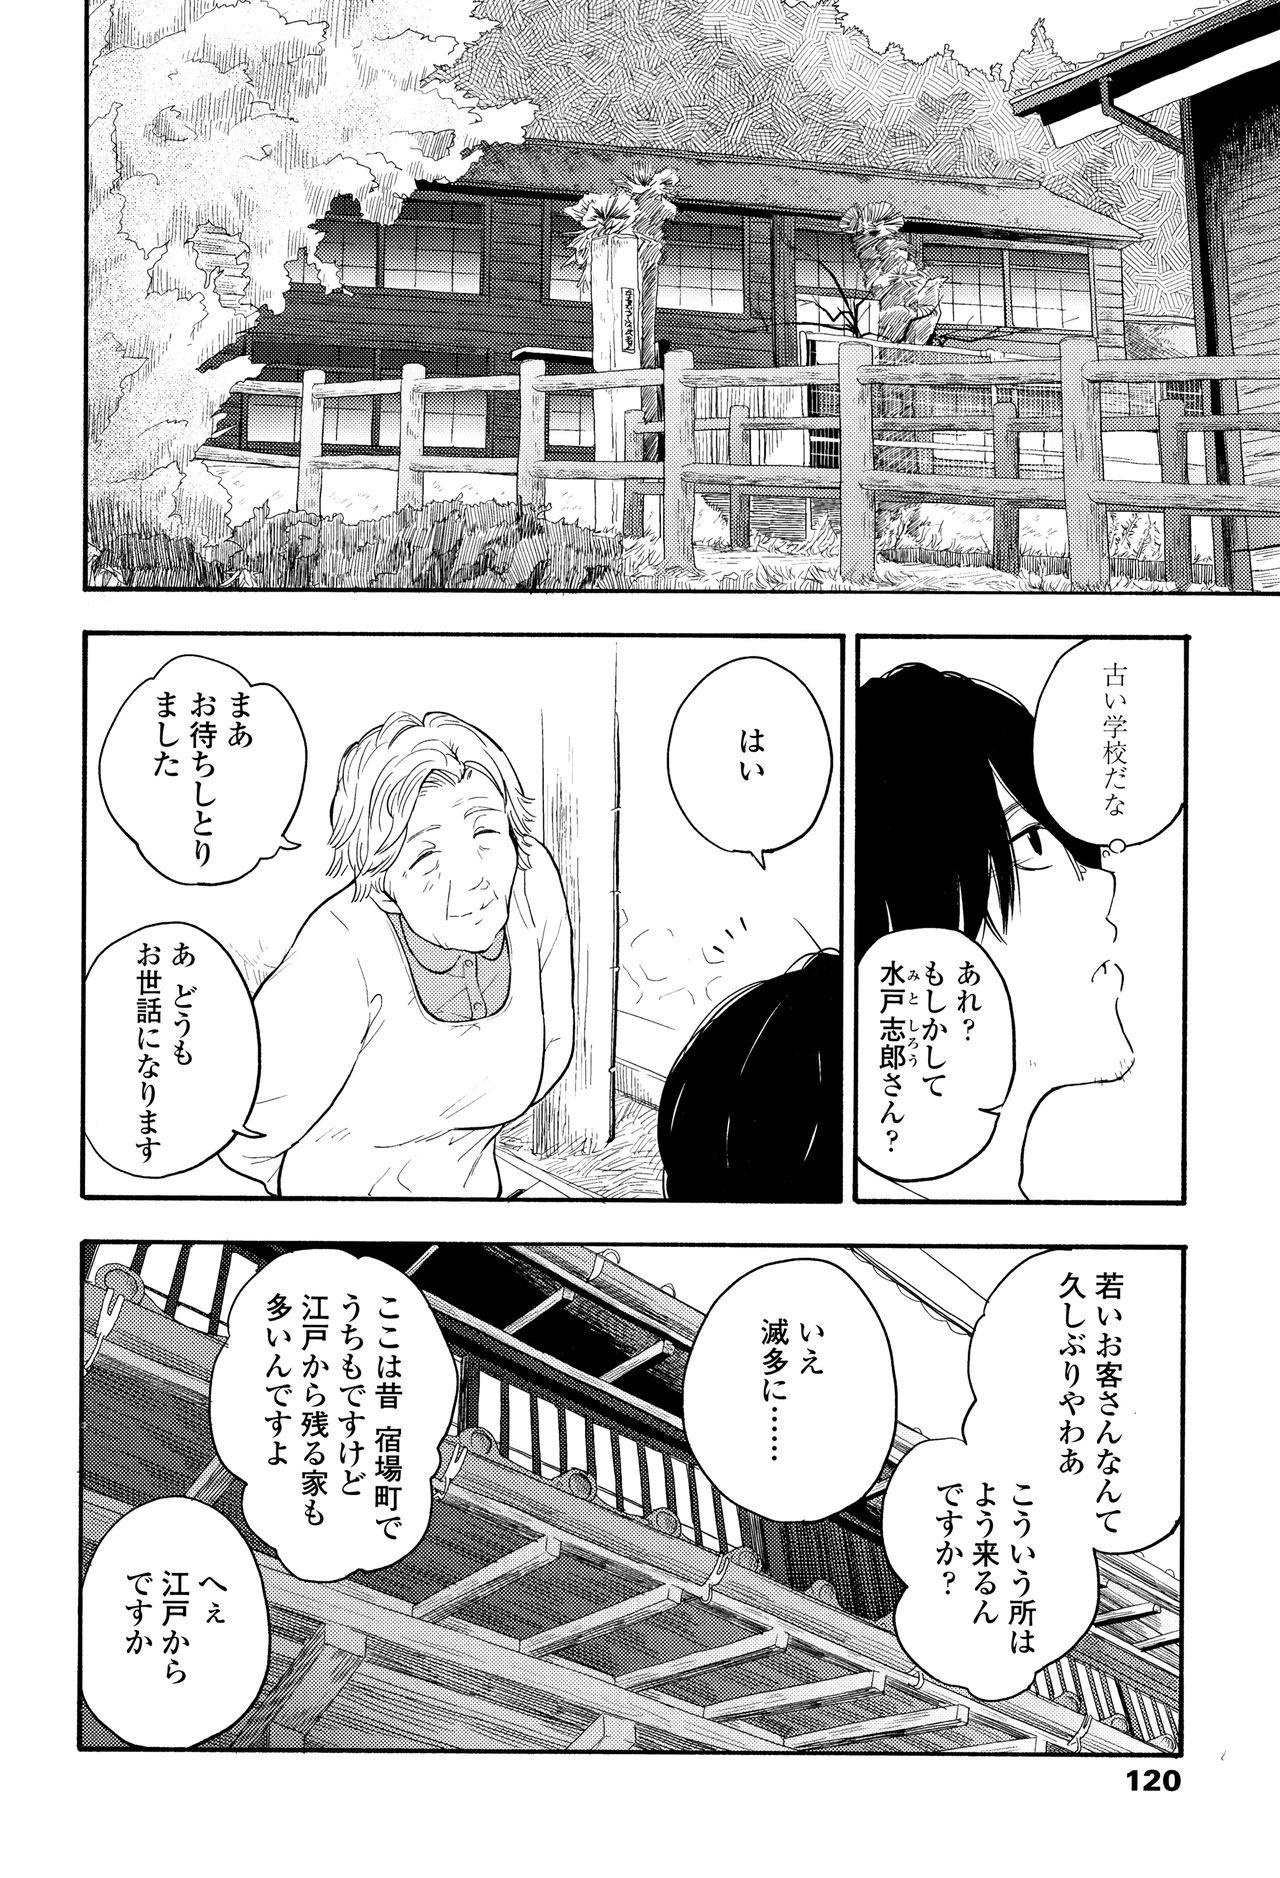 Shishunki no Eros - puberty eros 122